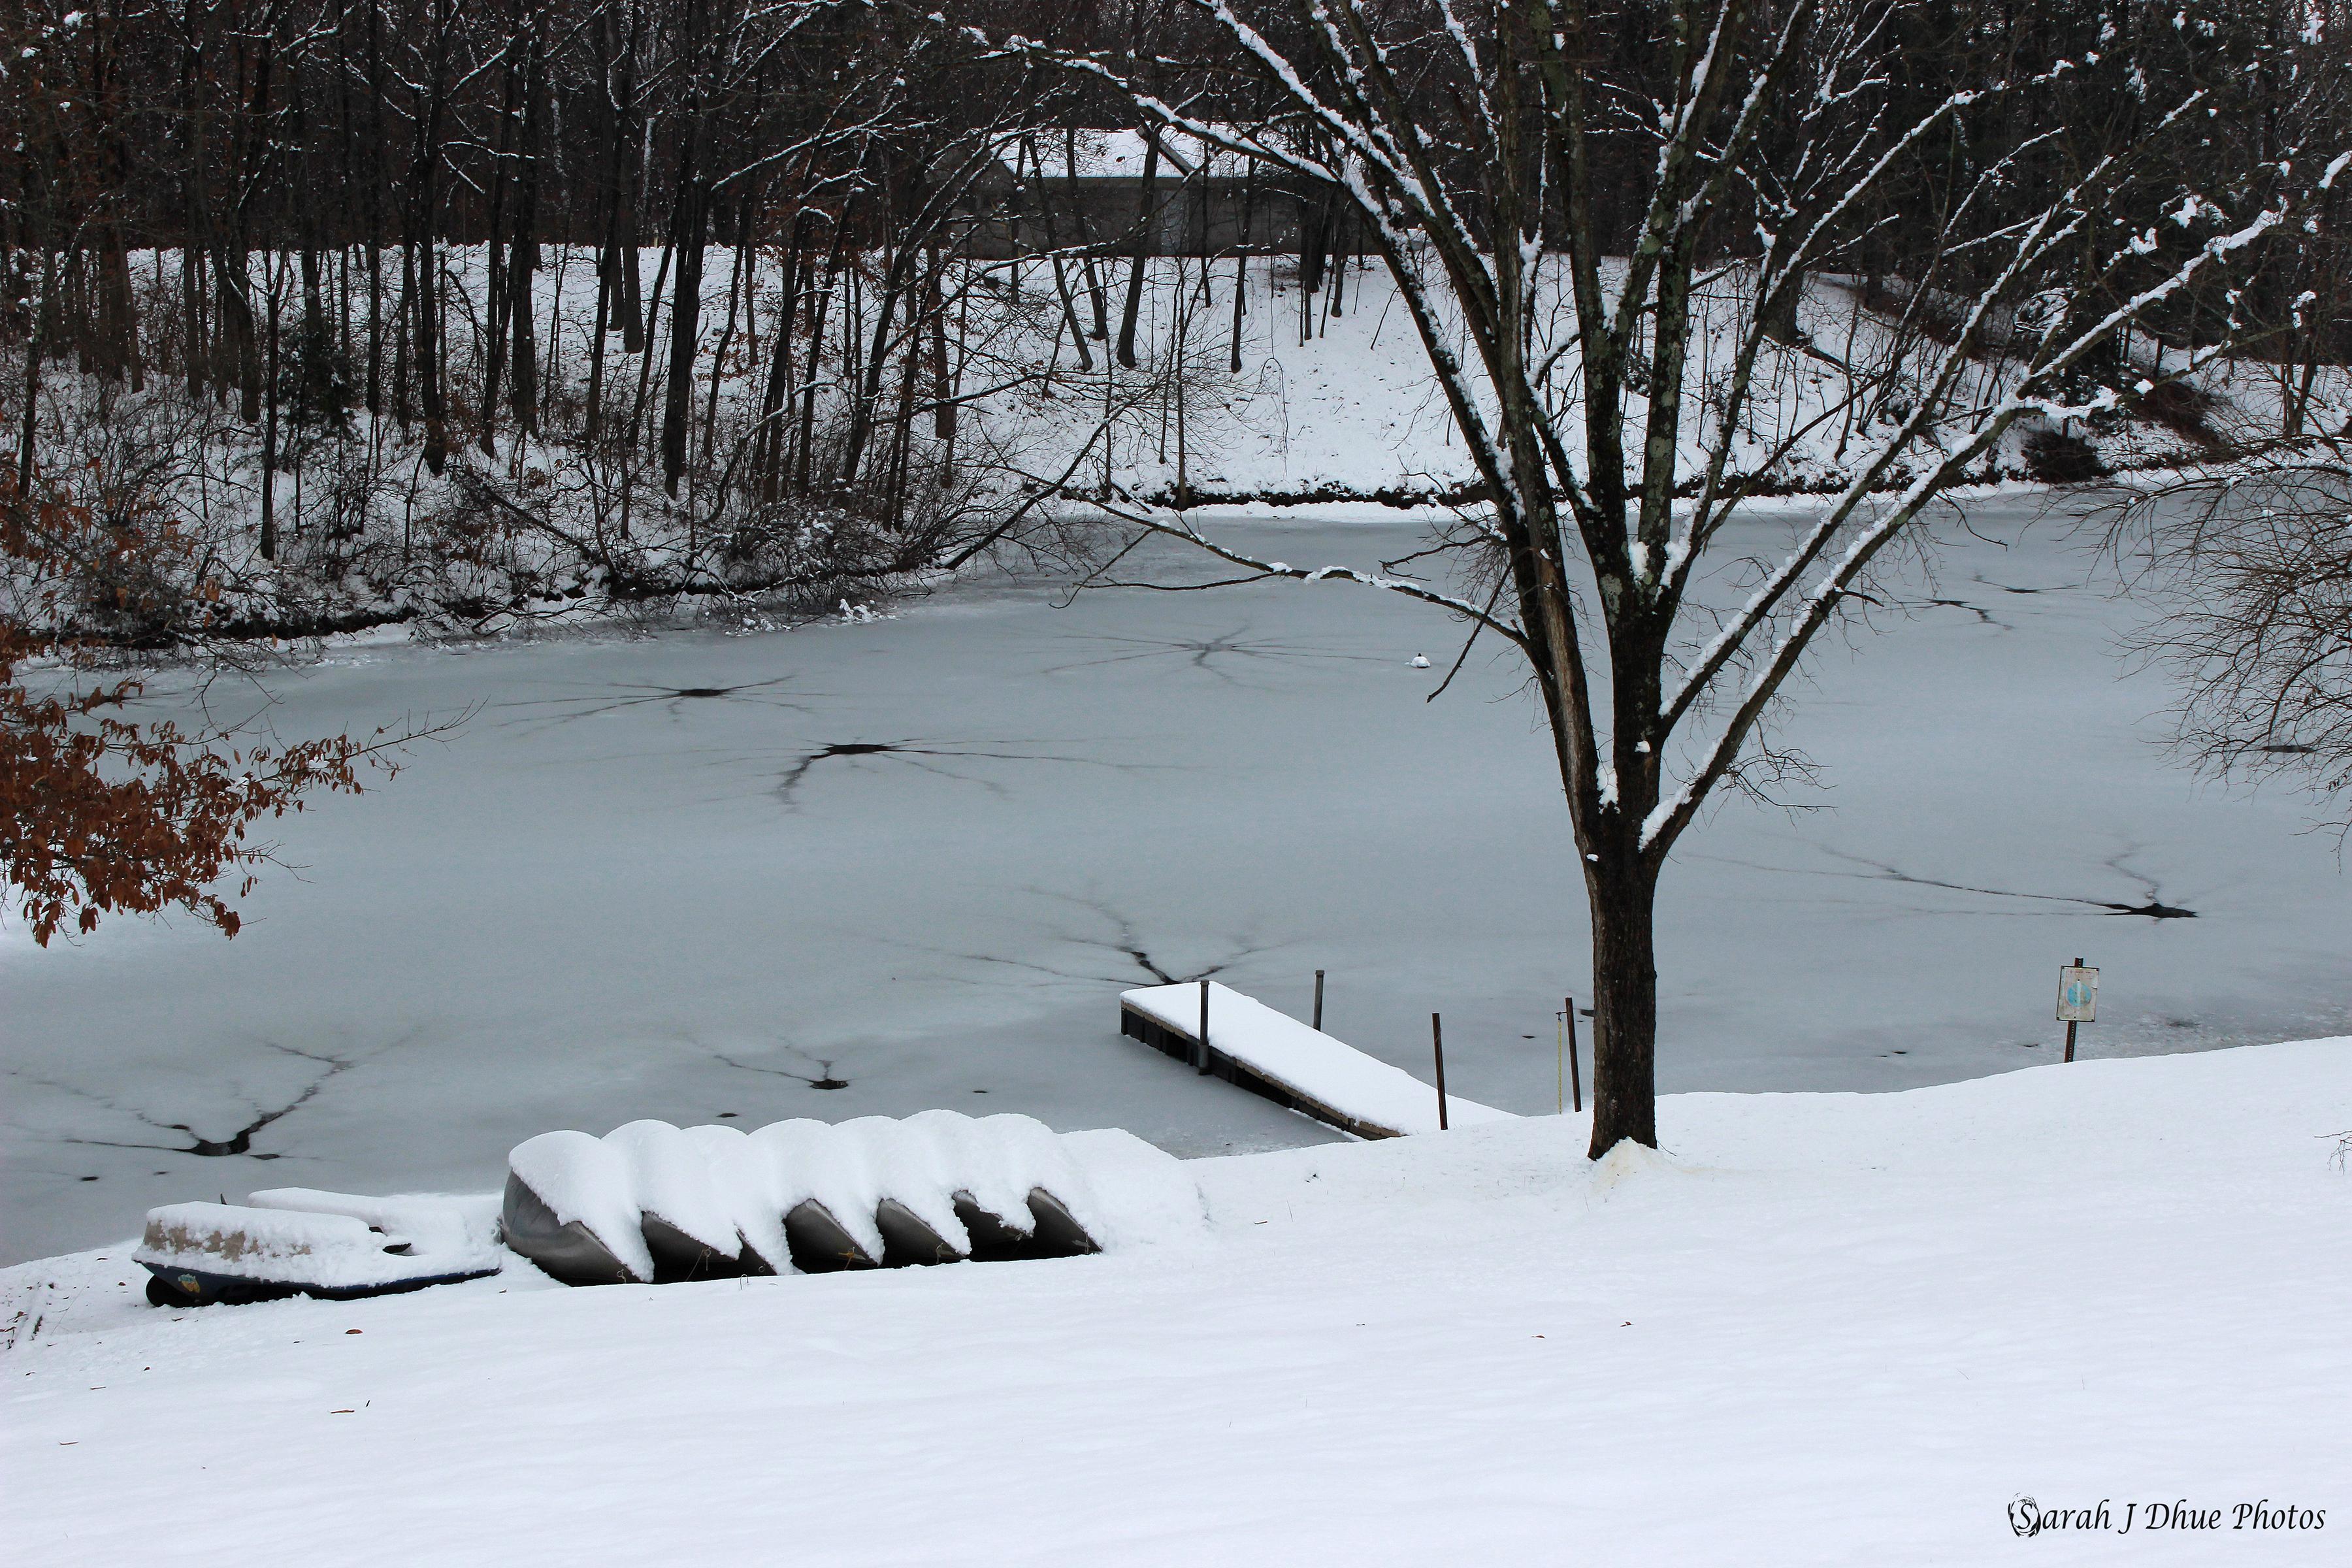 Frozen Lake & Canoes